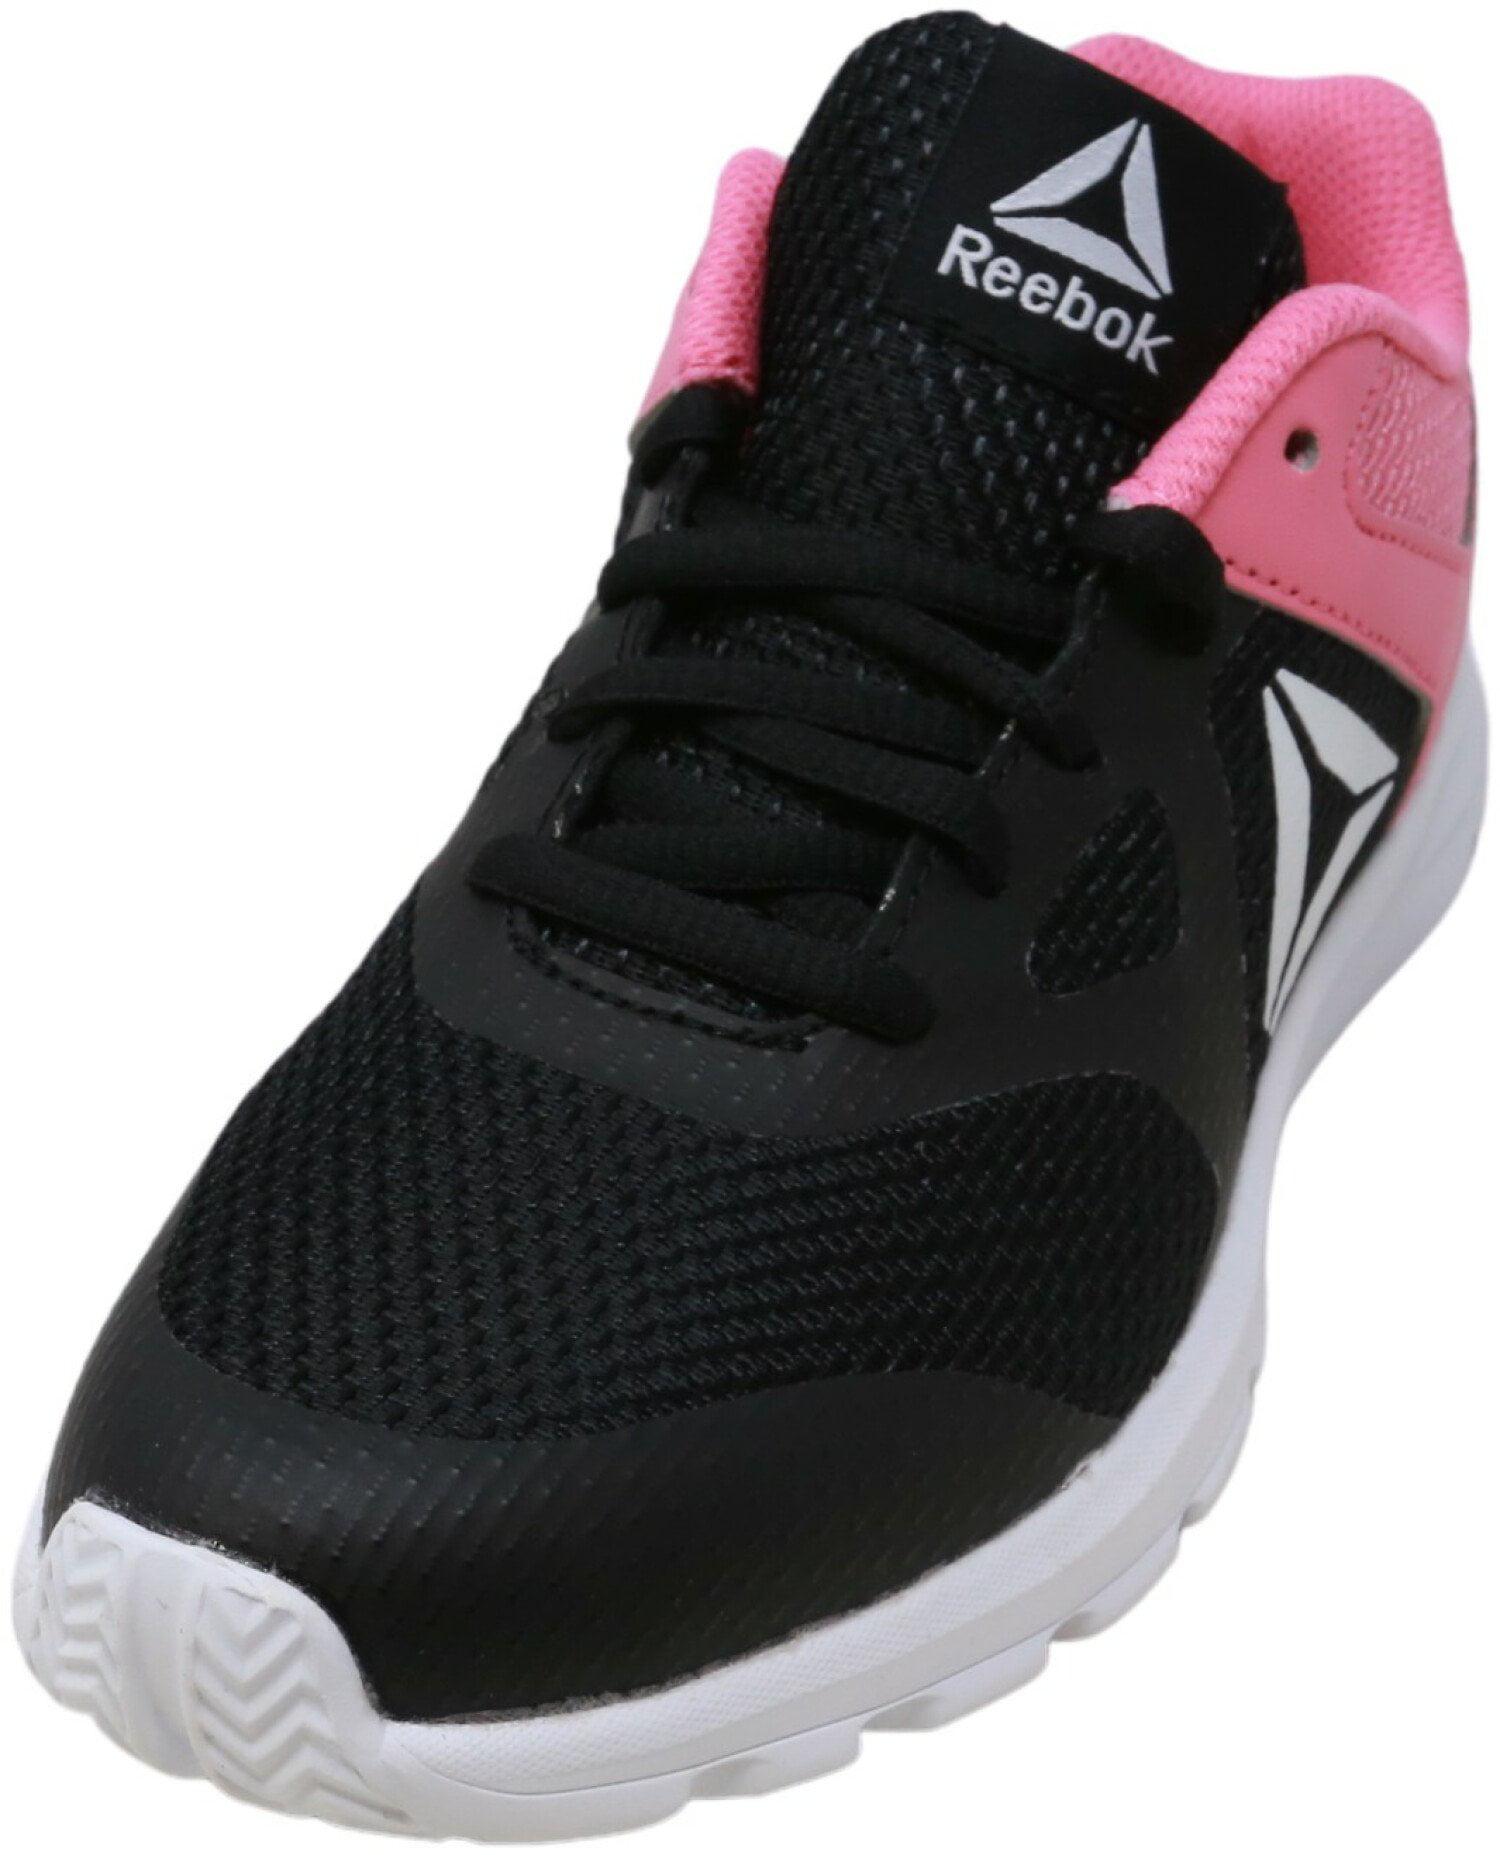 Pink and Black Shoe Reebok